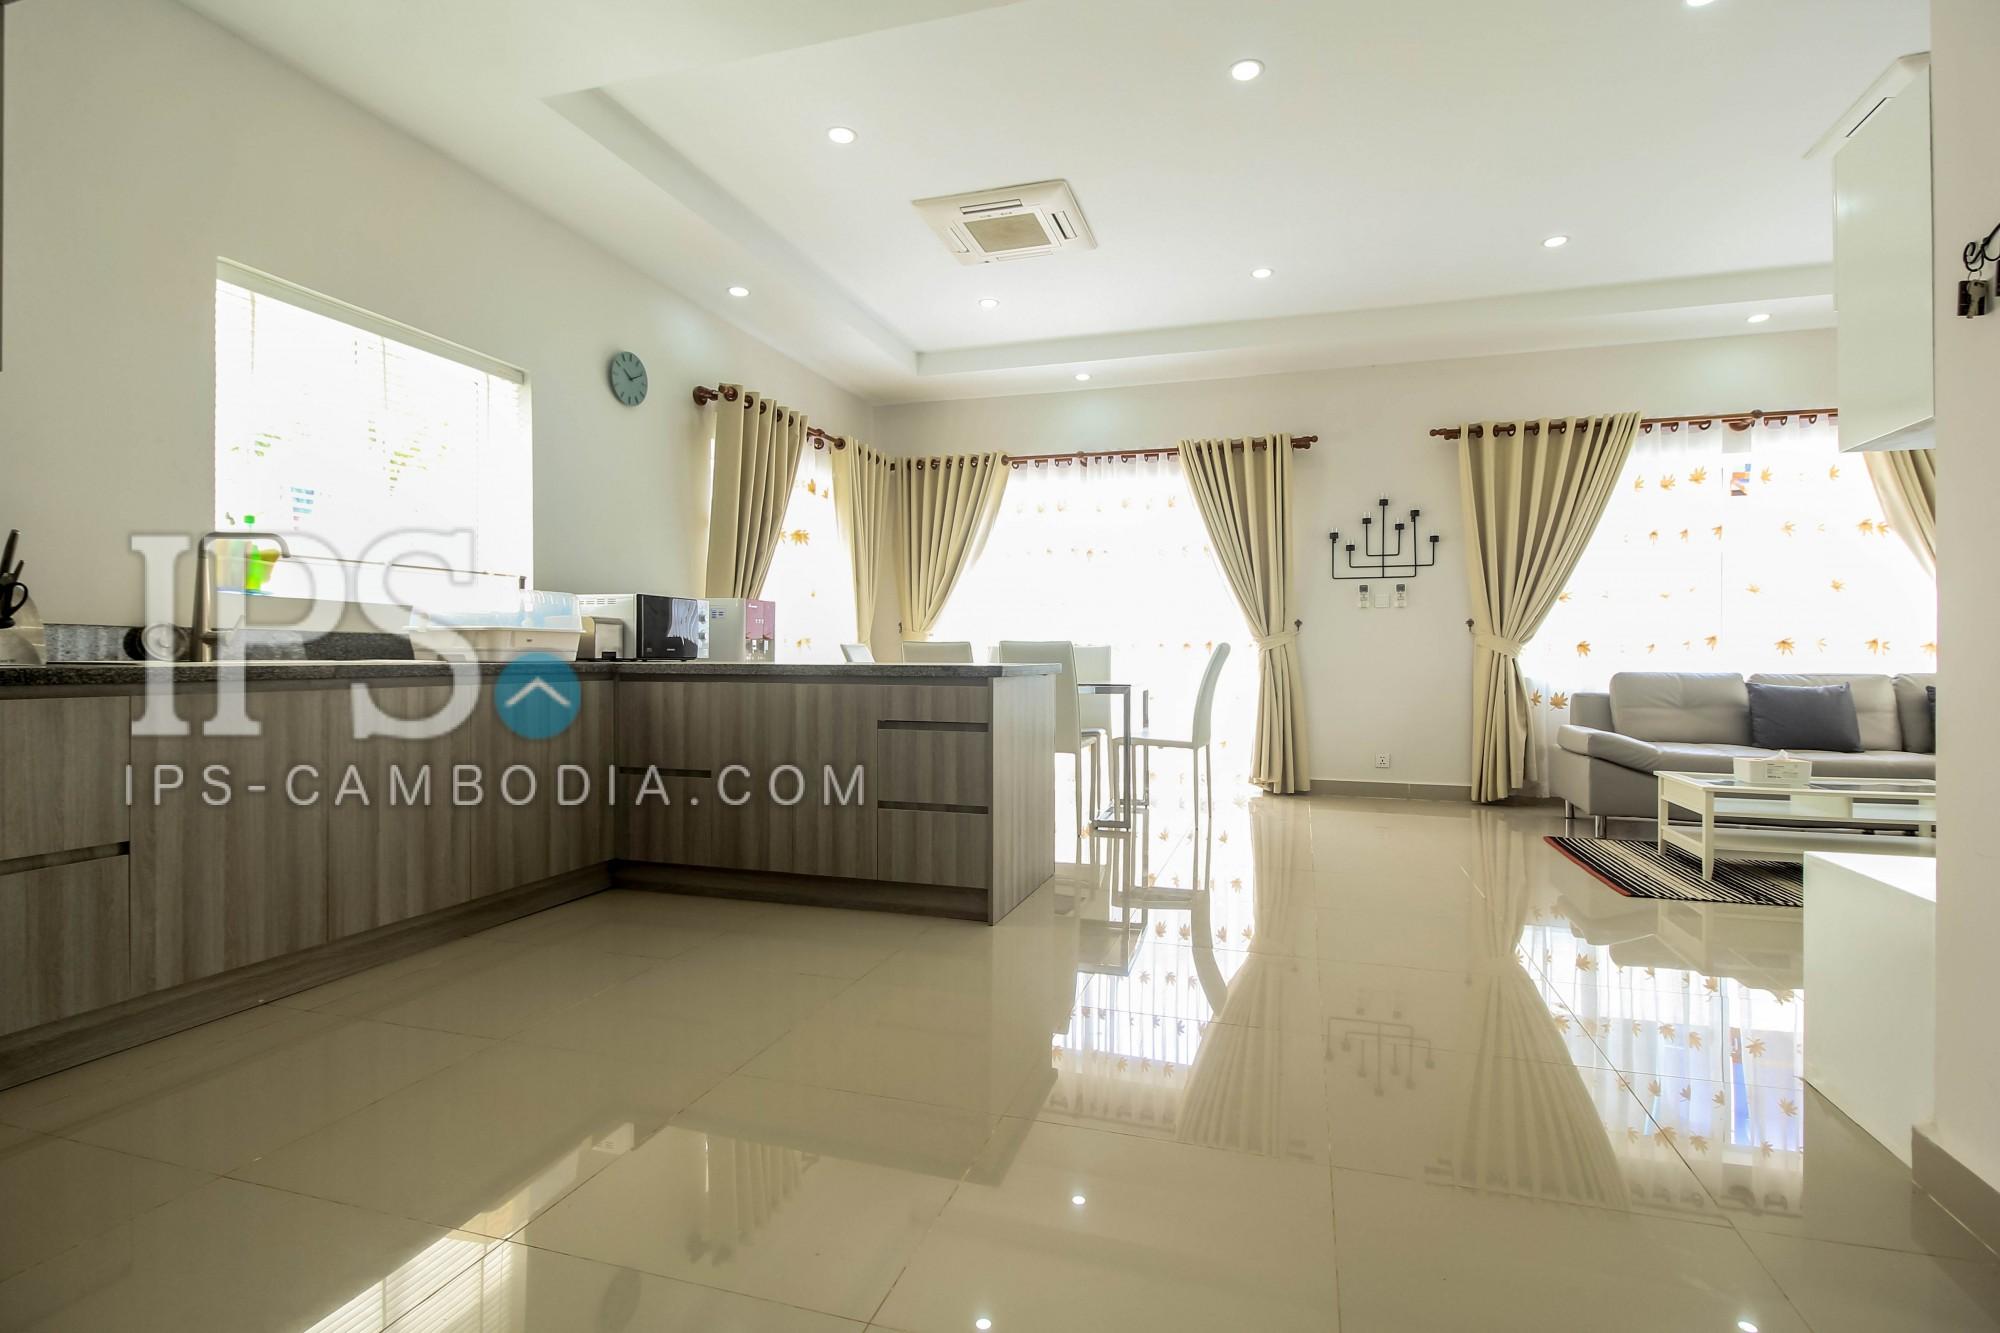 3 Bedroom Modern Villa  For Sale - Sra Ngae, Siem Reap